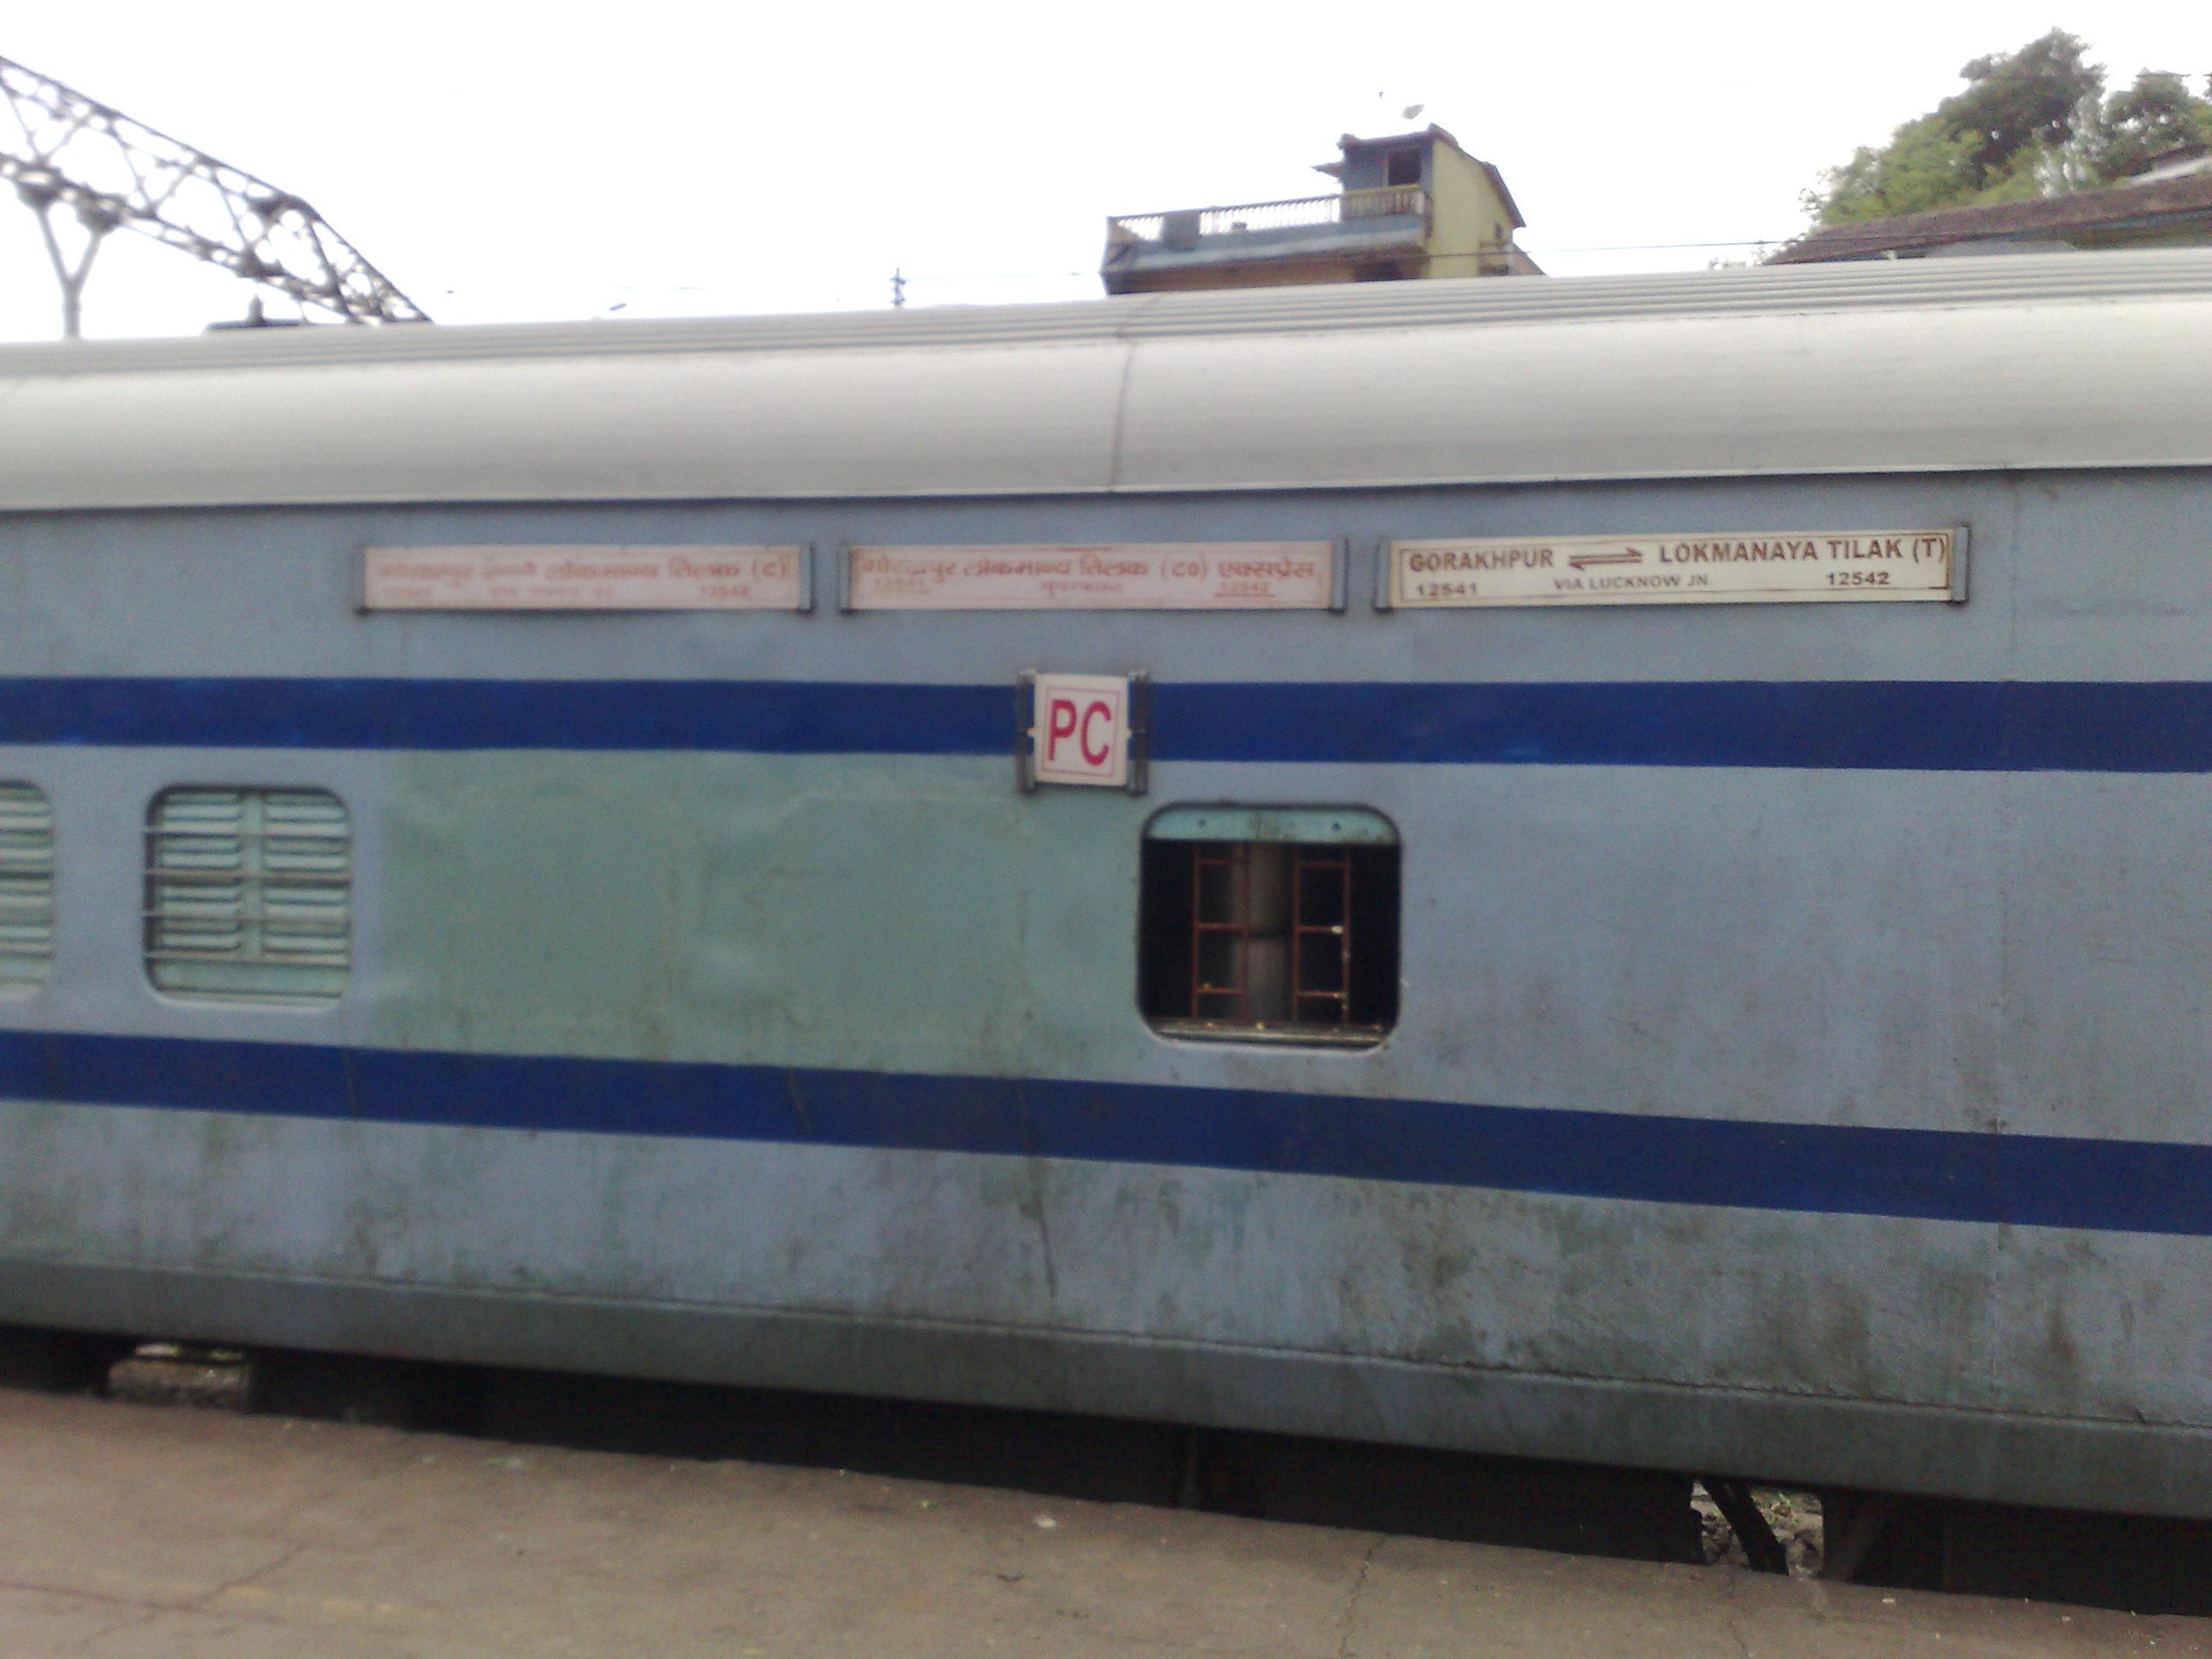 gorakhpur lokmanya tilak terminus superfast express - pantry car coach.jpg